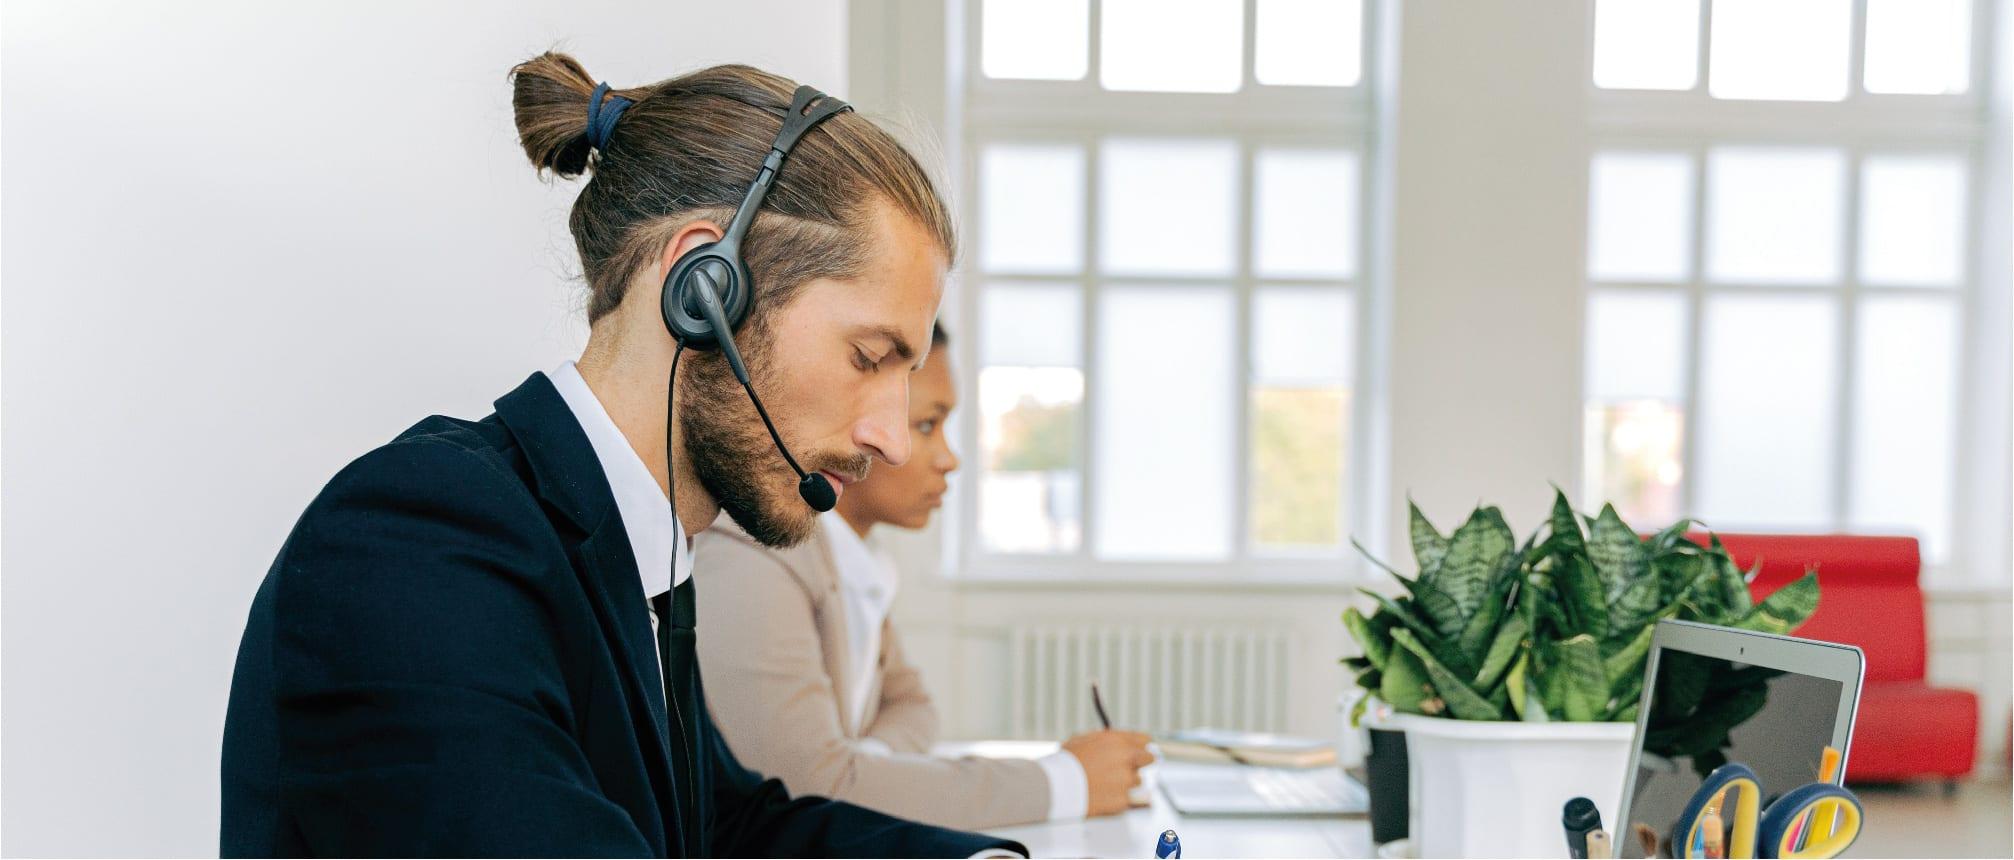 Dutch customer service agent